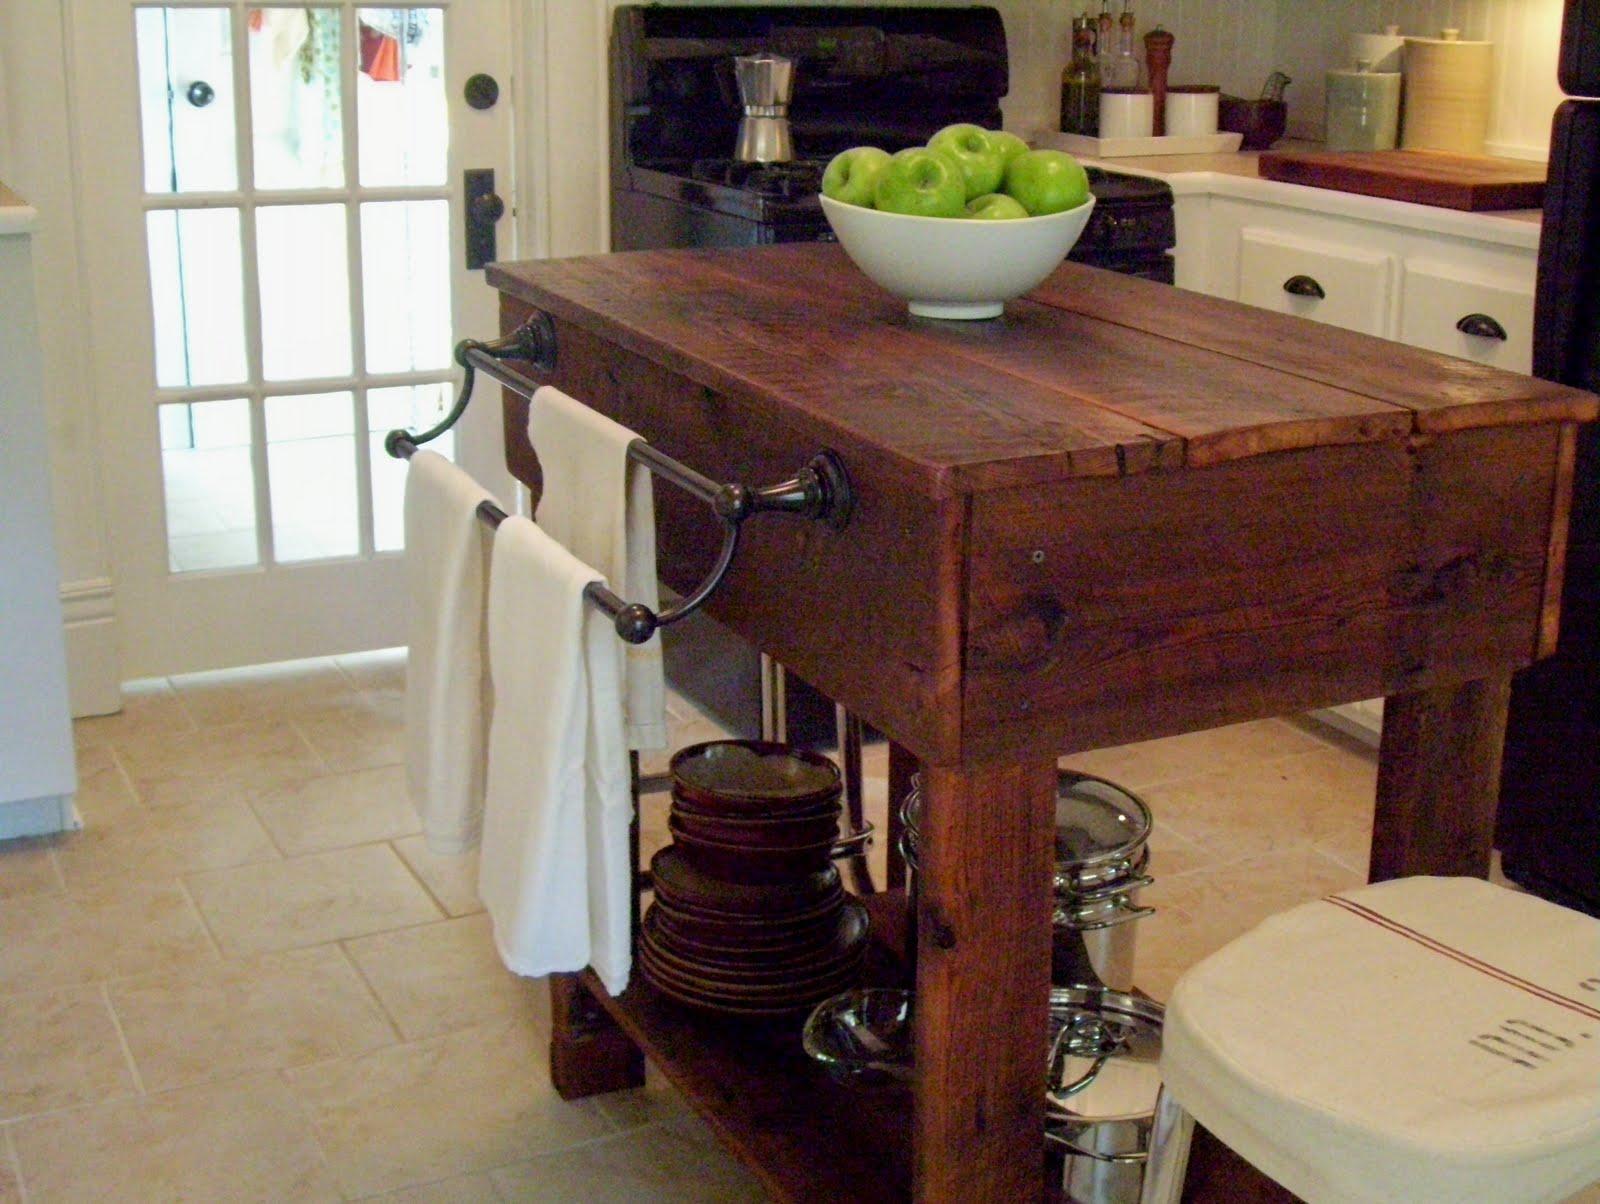 wood kitchen table sets wood kitchen table sets Wood kitchen table sets Photo 1